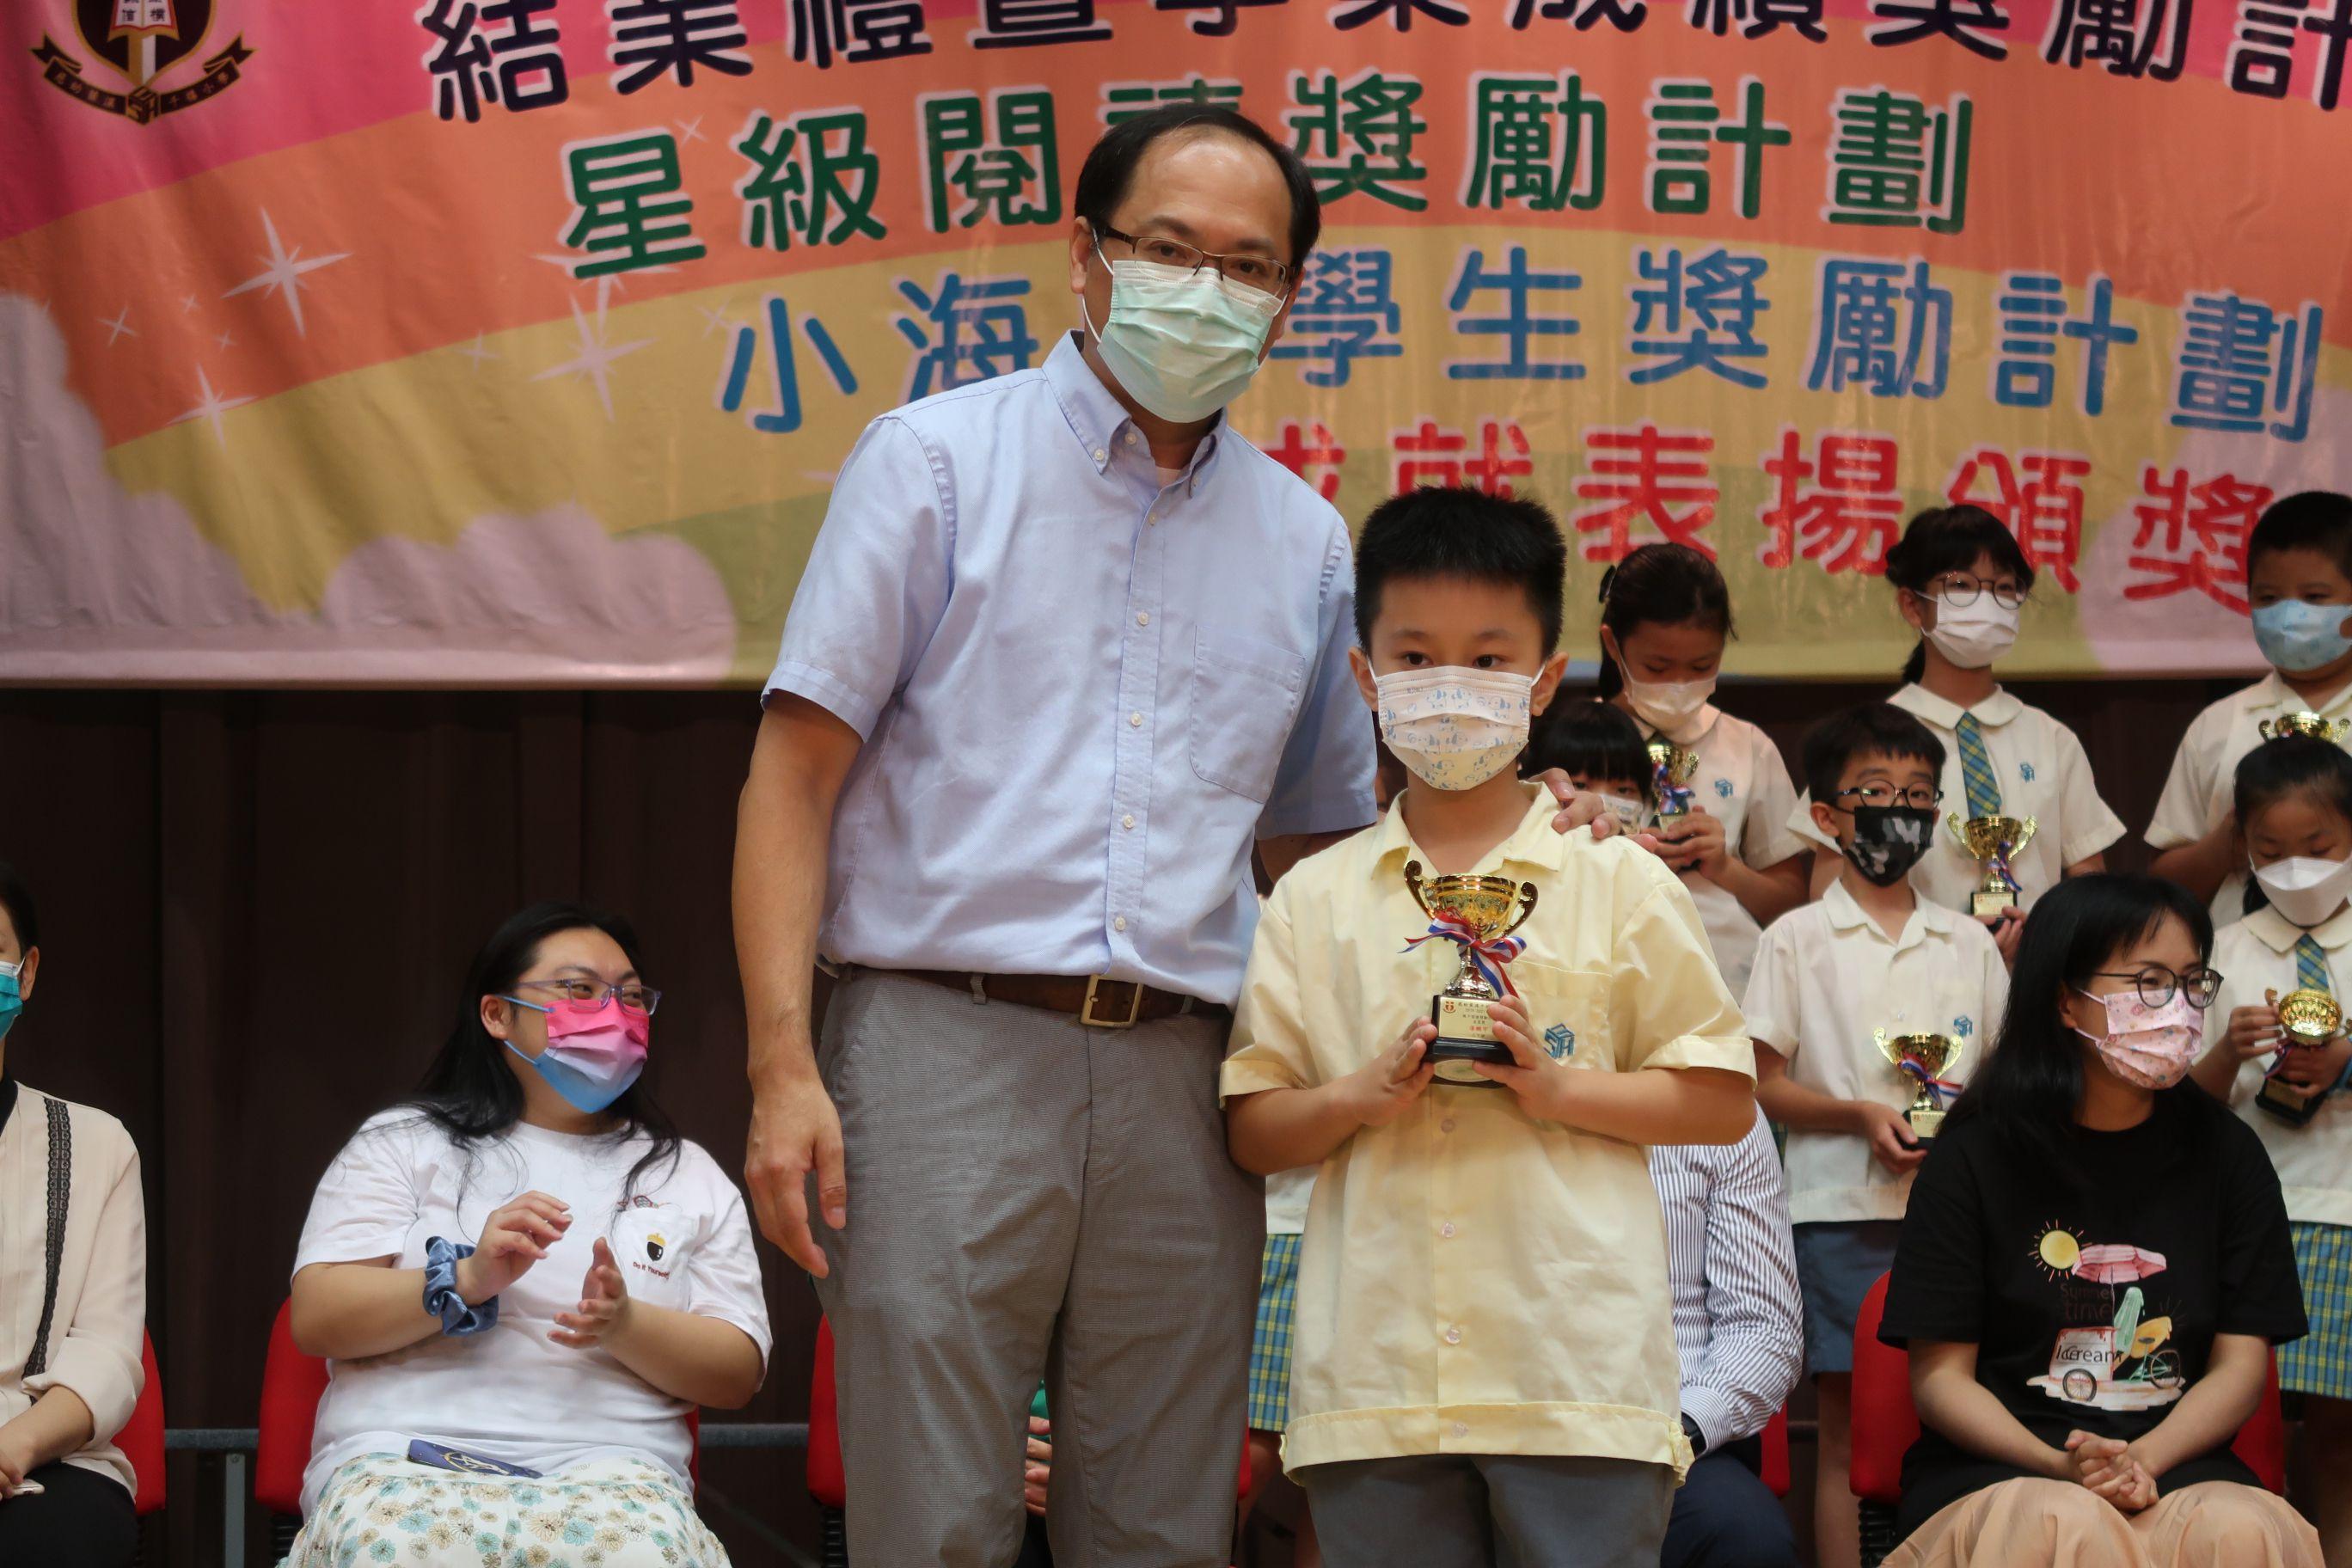 https://syh.edu.hk/sites/default/files/img_5856.jpg